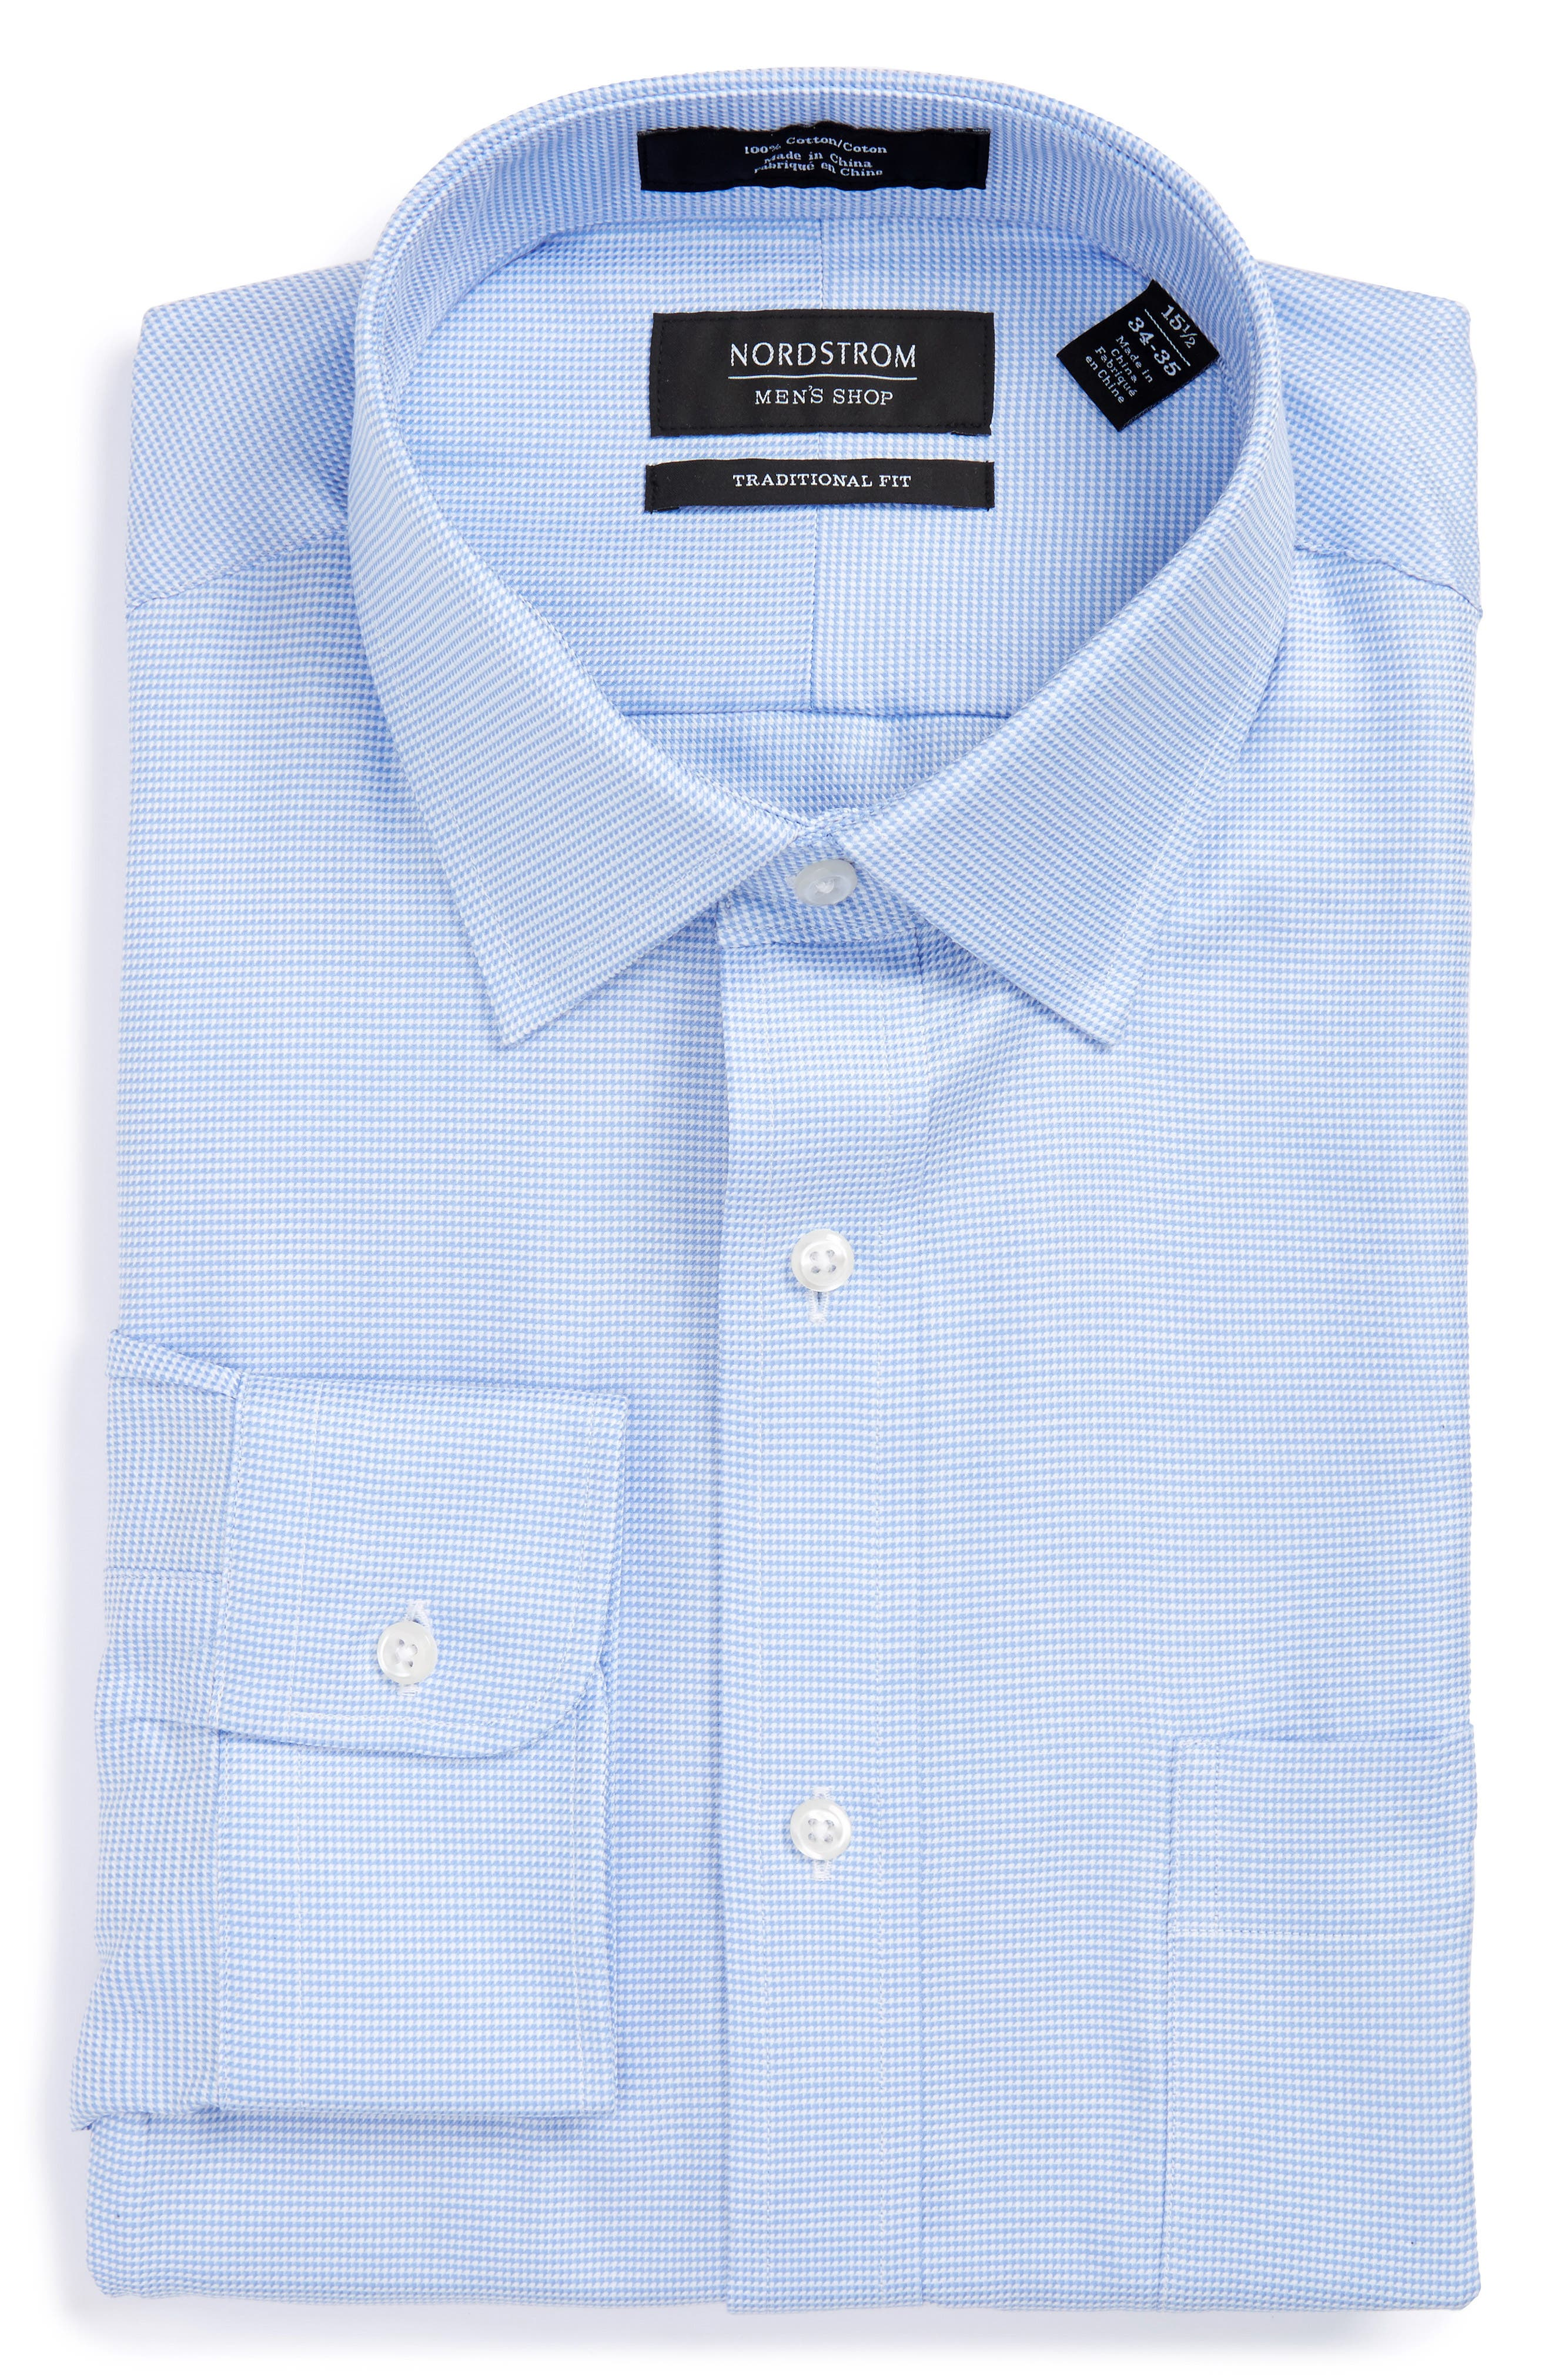 Nordstrom Men's Shop Traditional Fit Textured Dress Shirt